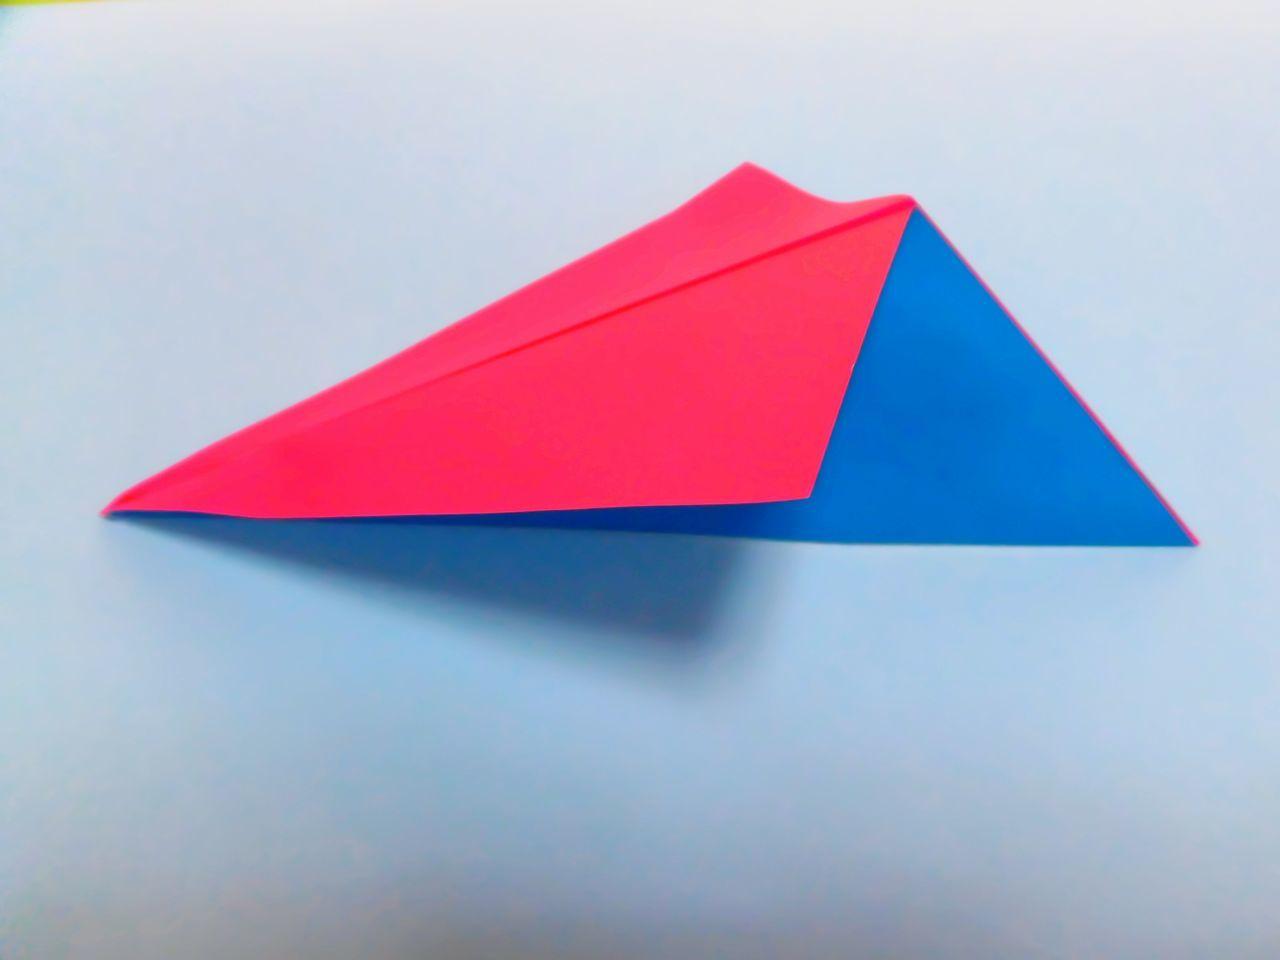 Paper plane Paper Paperart Paperwork Paper Art Papercraft Paperplane Paper Plane Red Origami Origamiart Origami Art Origami Time Origami Craft Origami Plane